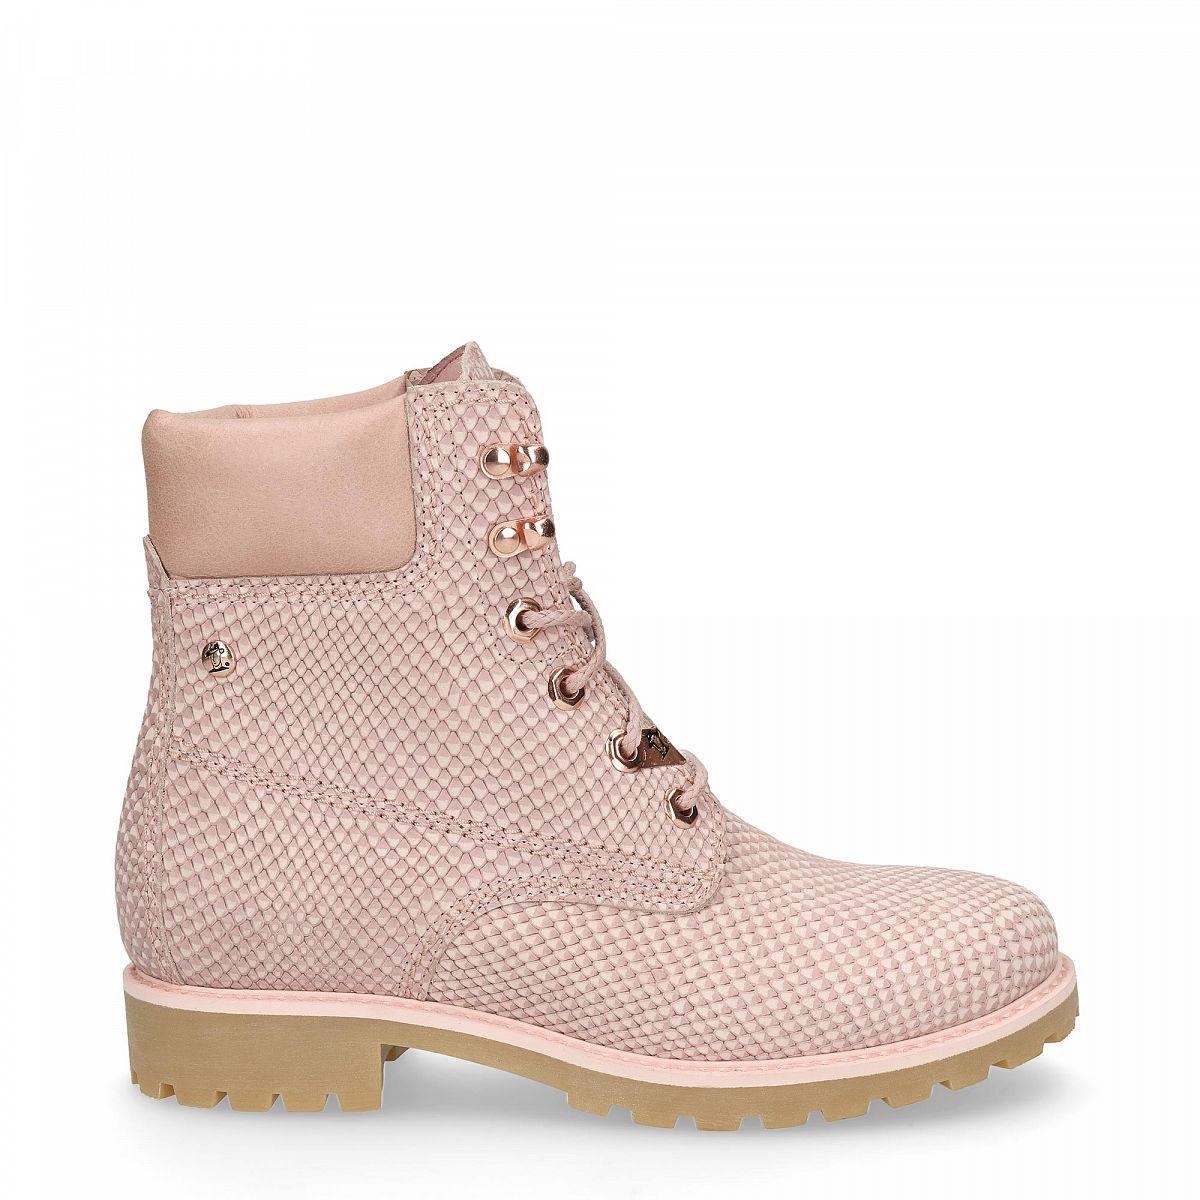 panama jack botas rosas, Panama Jack Botas De Hombre Napa